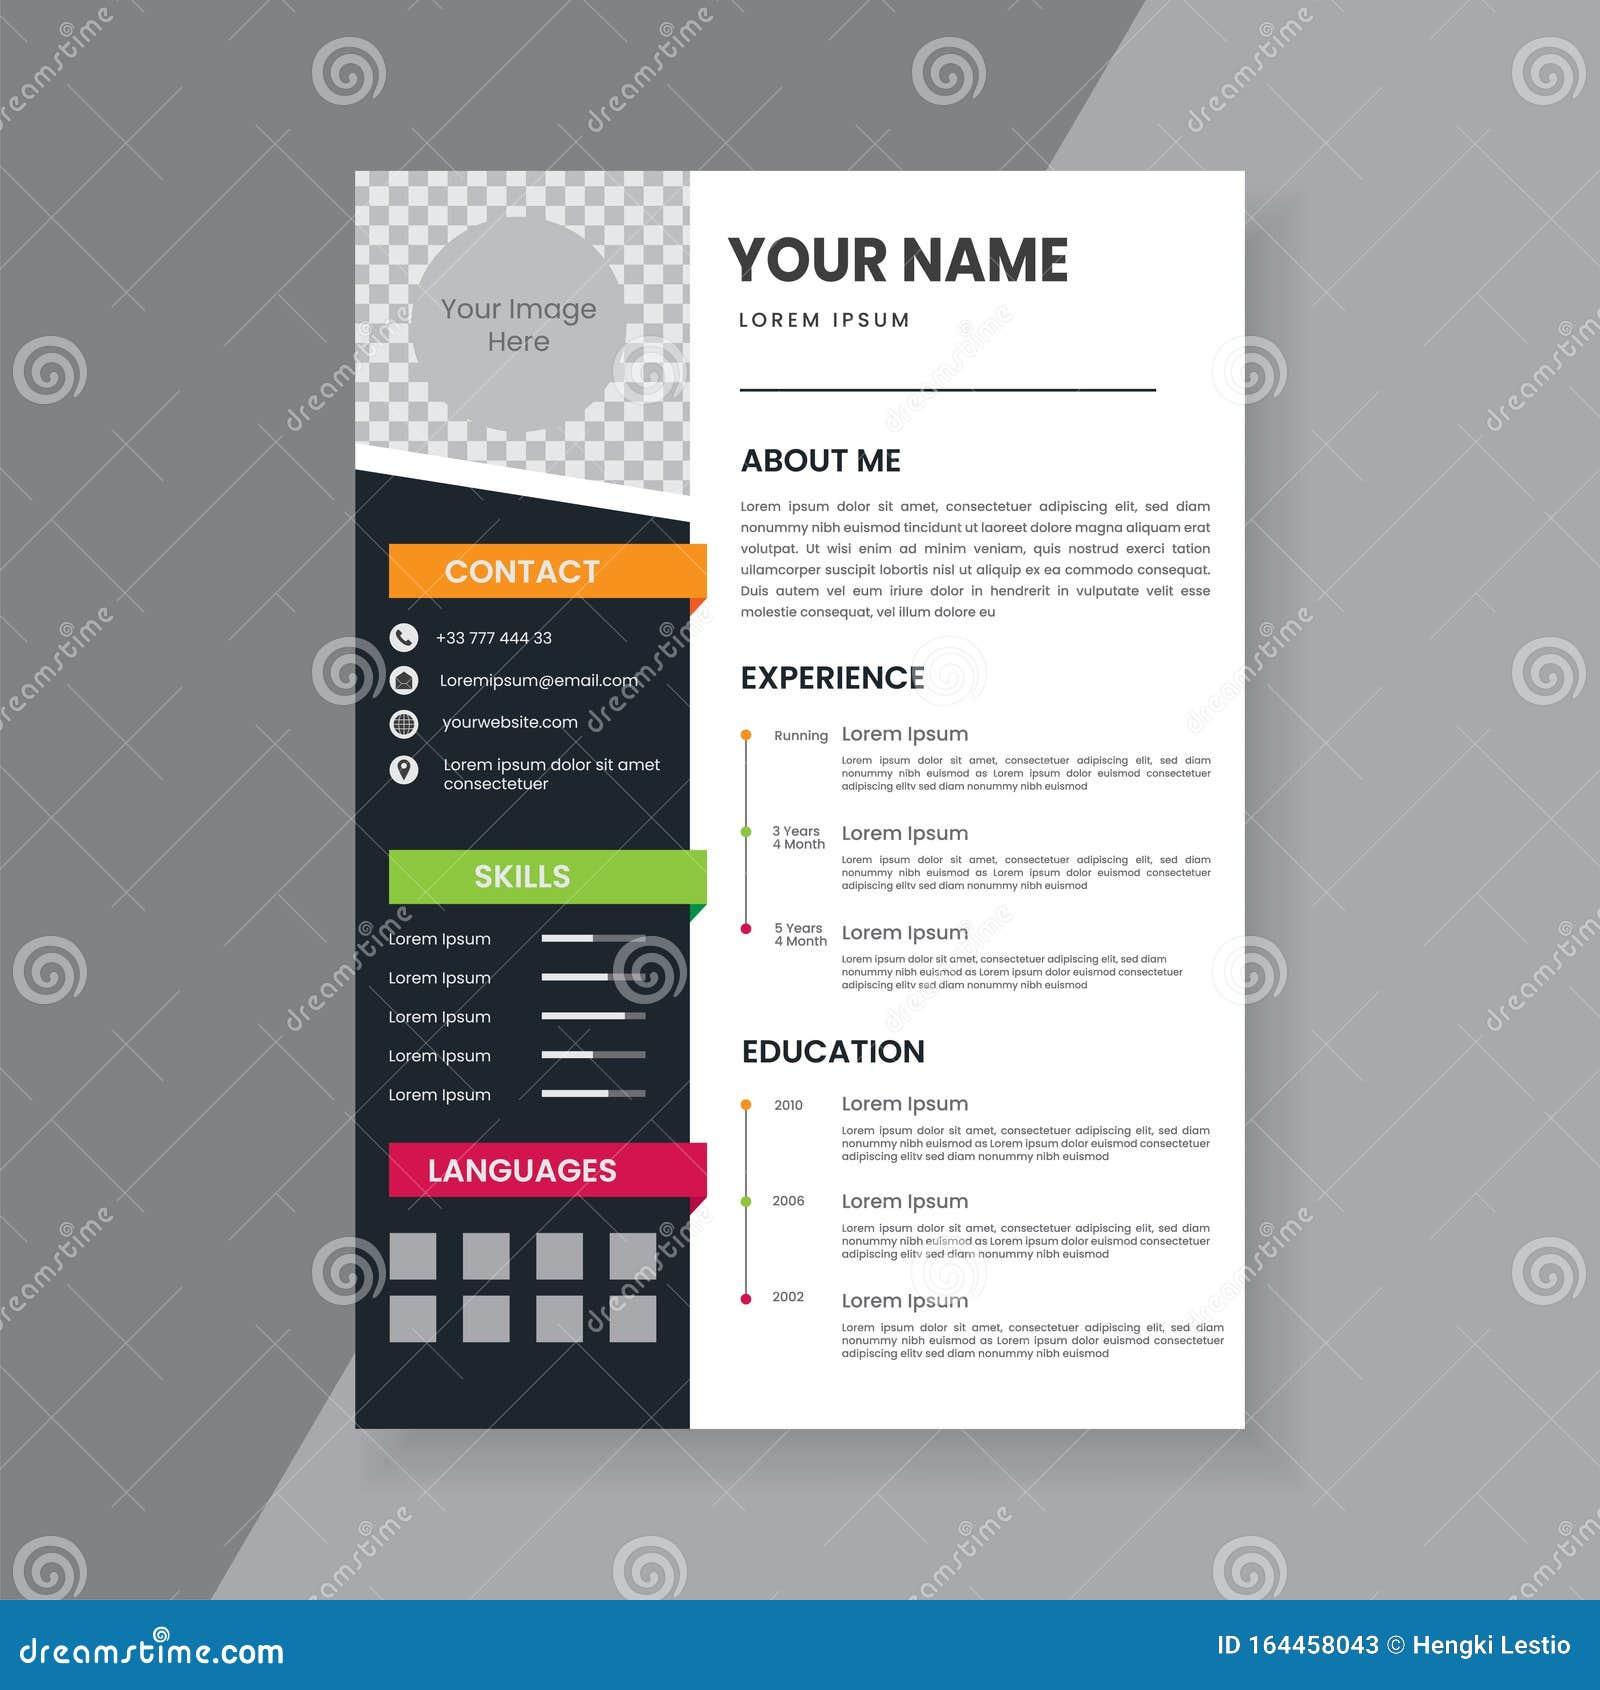 Creative Cv Design from thumbs.dreamstime.com